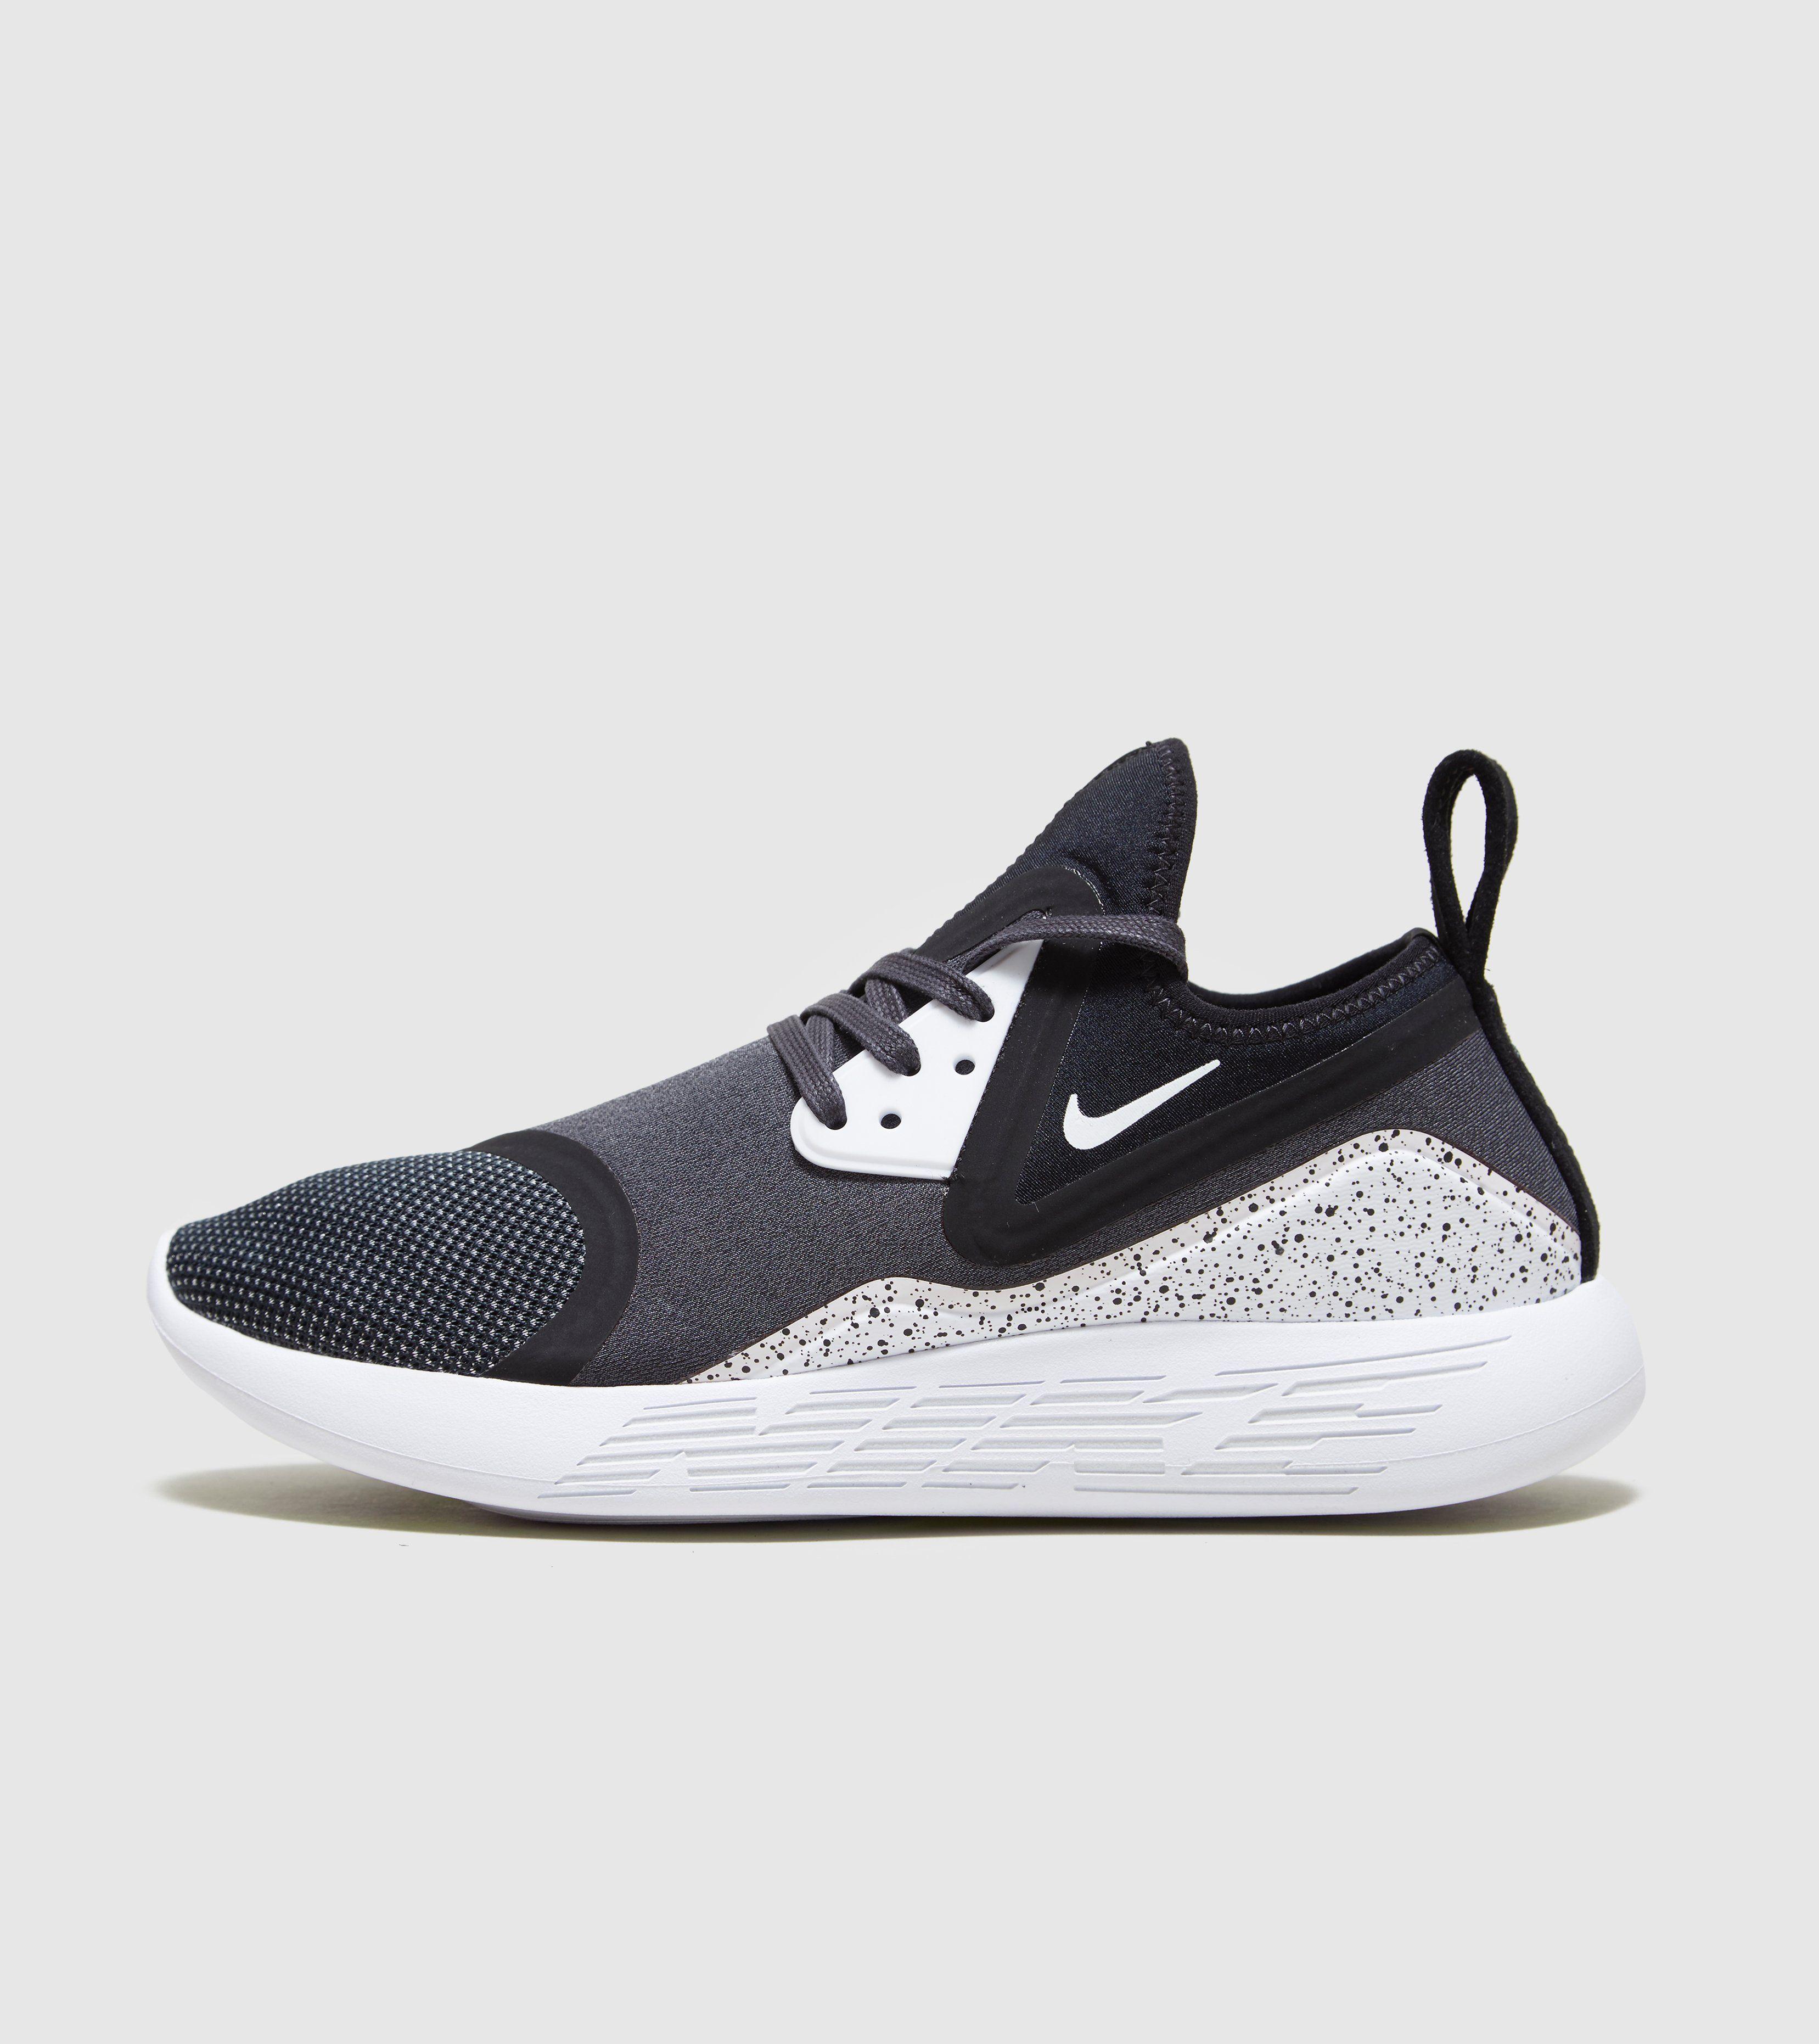 Nike Lunarcharge Essential